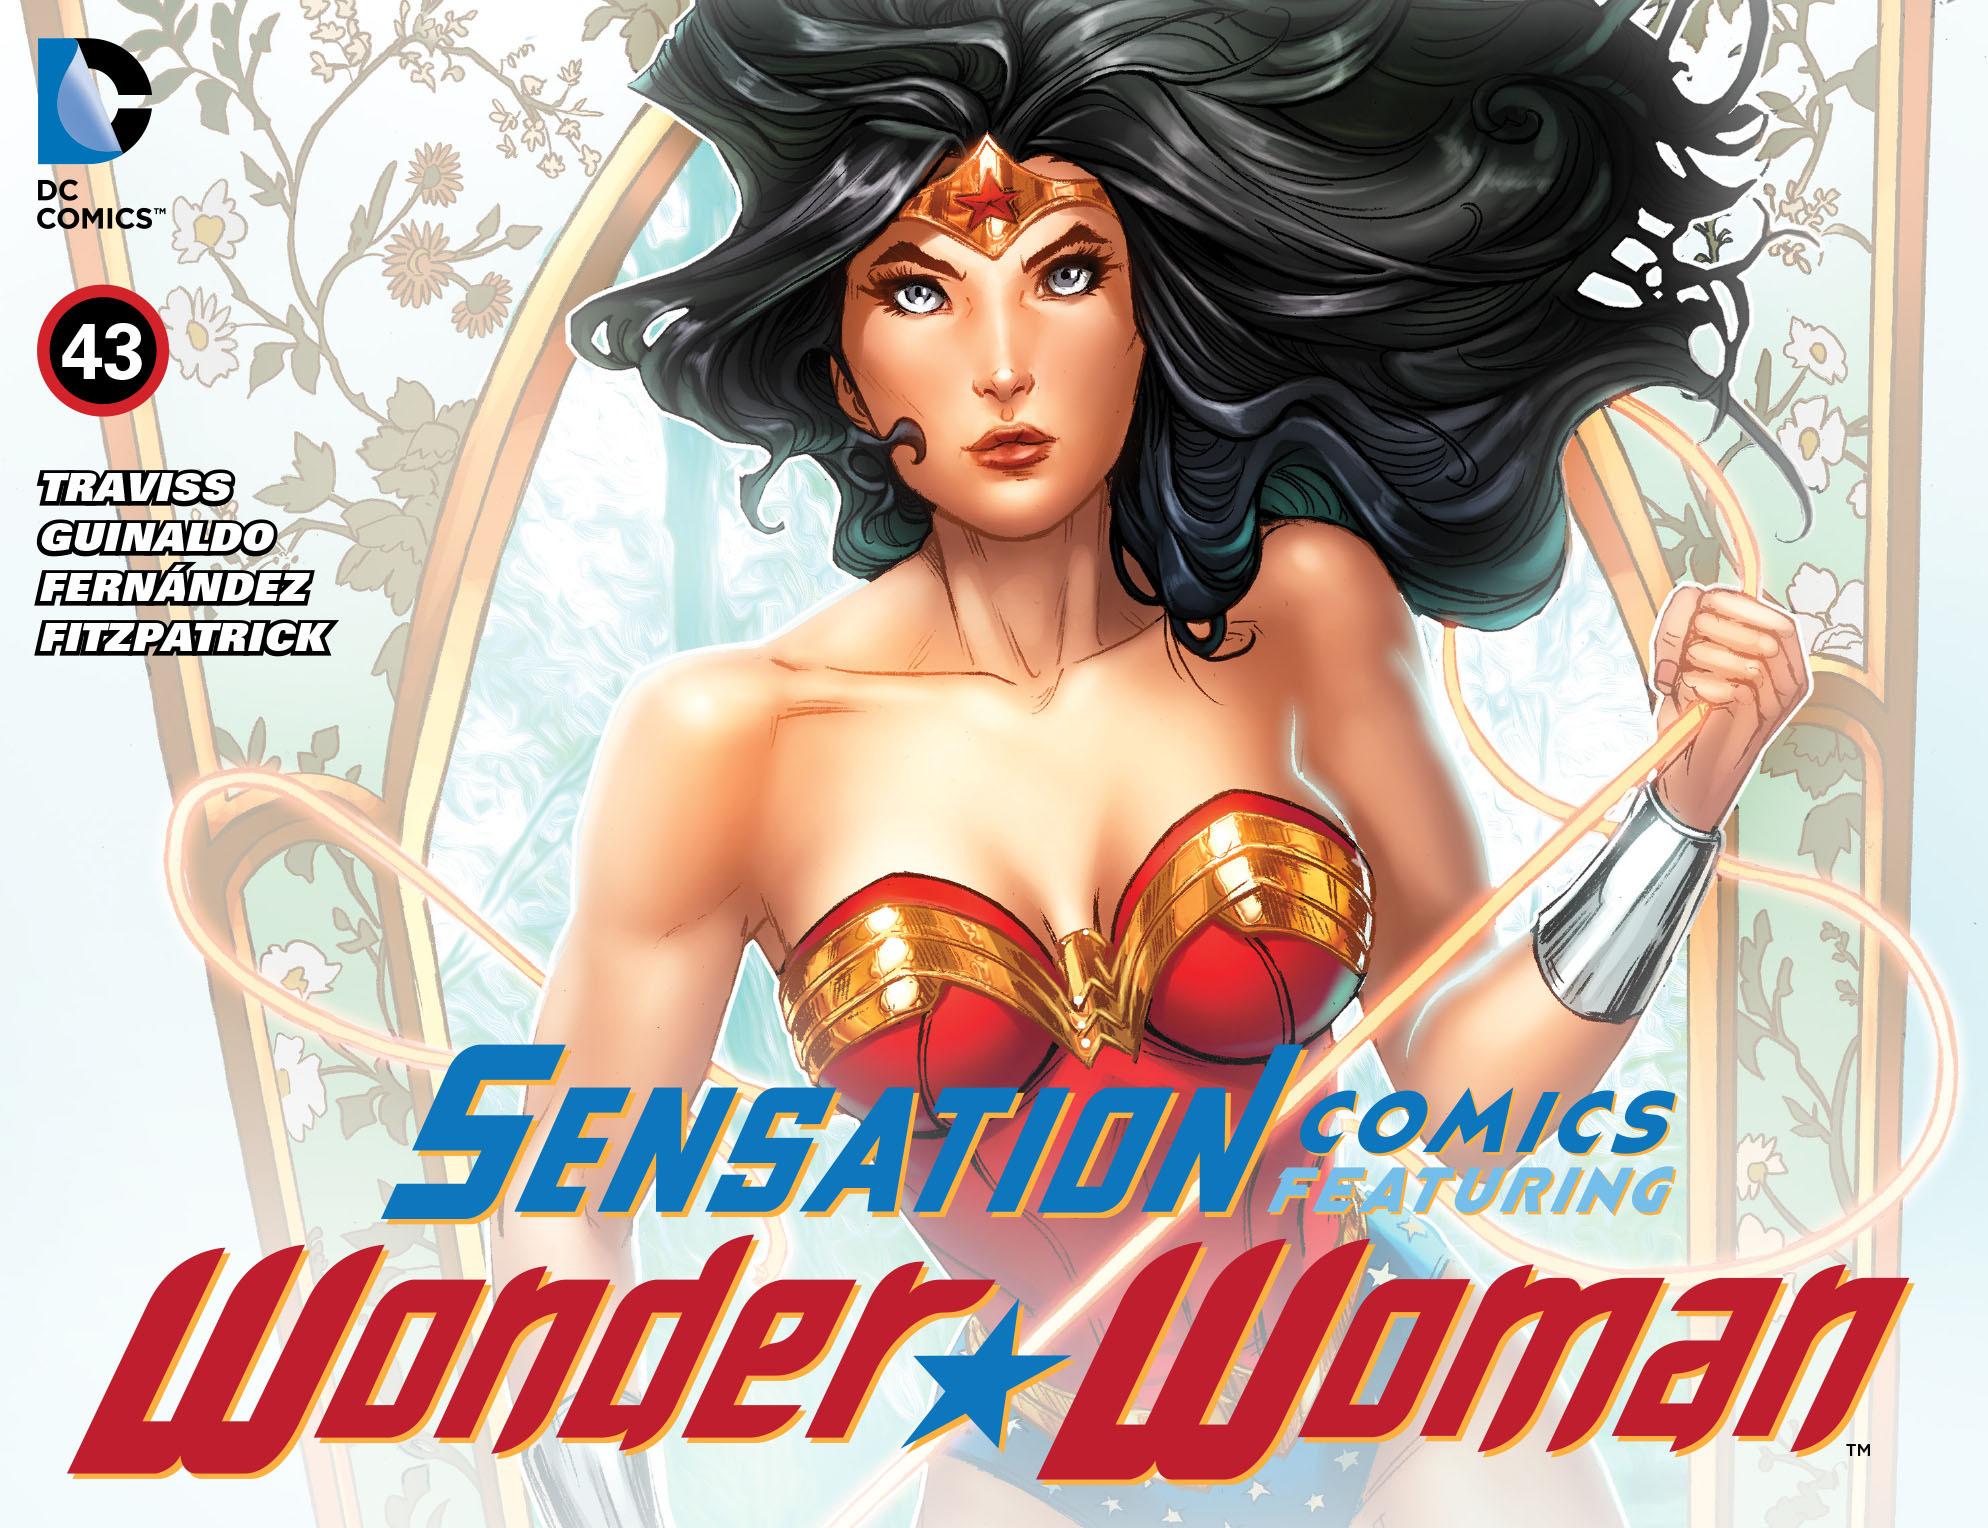 Read online Sensation Comics Featuring Wonder Woman comic -  Issue #43 - 1